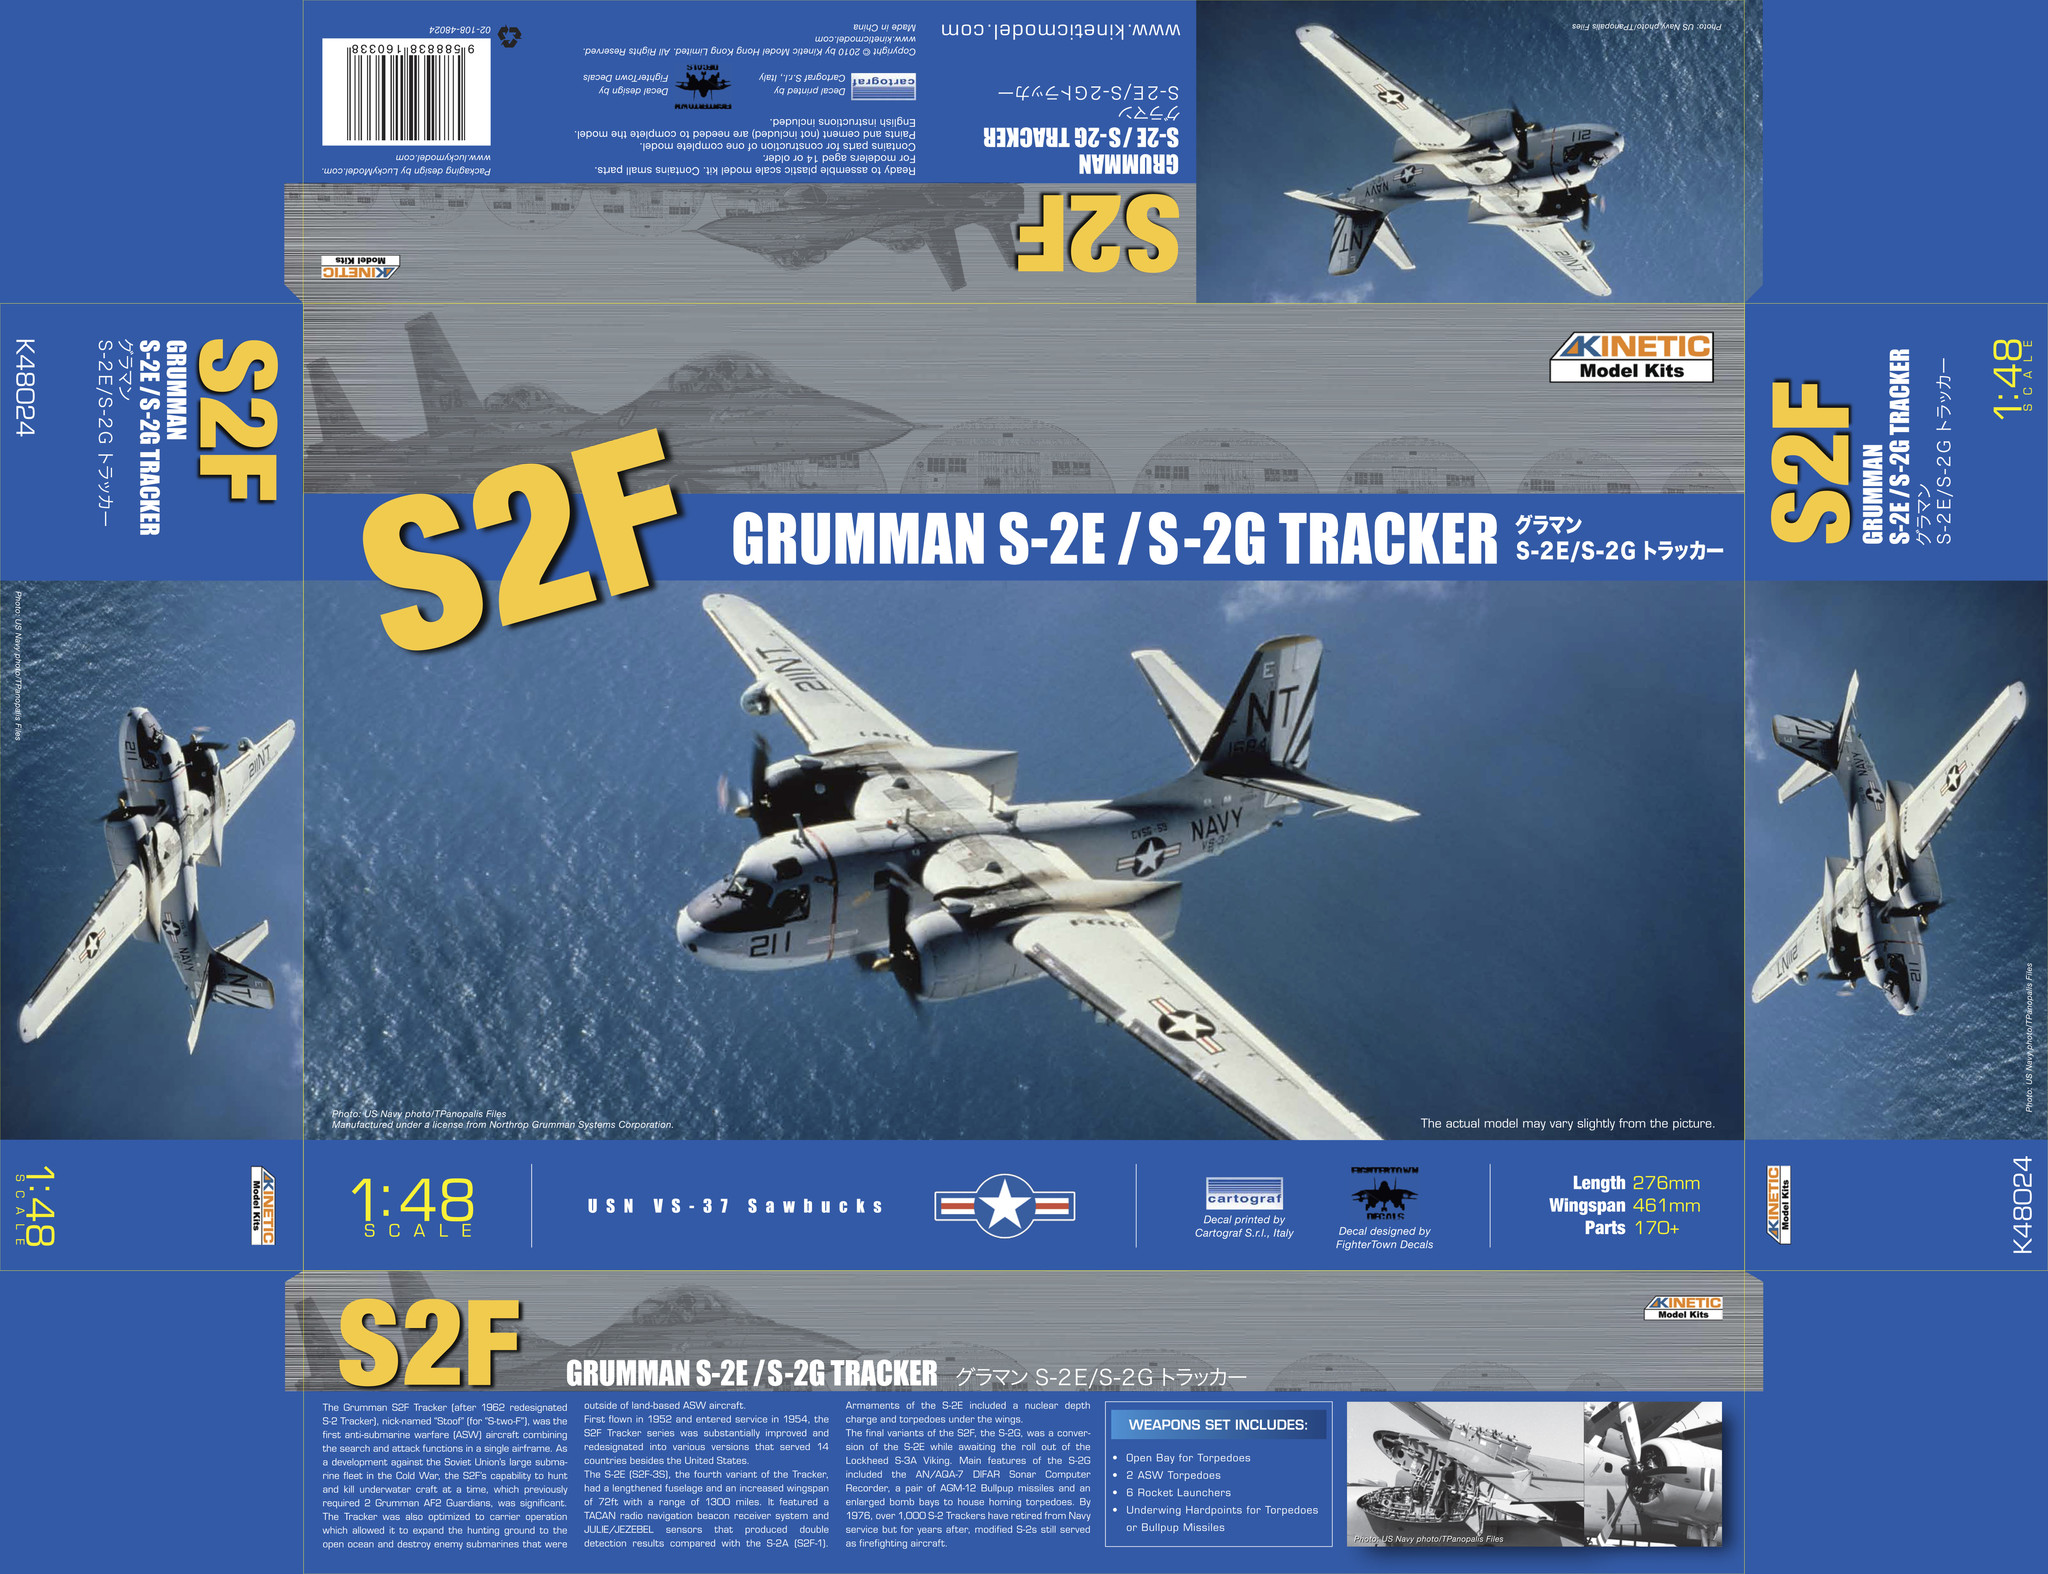 Kinetic Grumman S-2E/G Tracker - Scale 1/48 - Kinetic - KIN48024